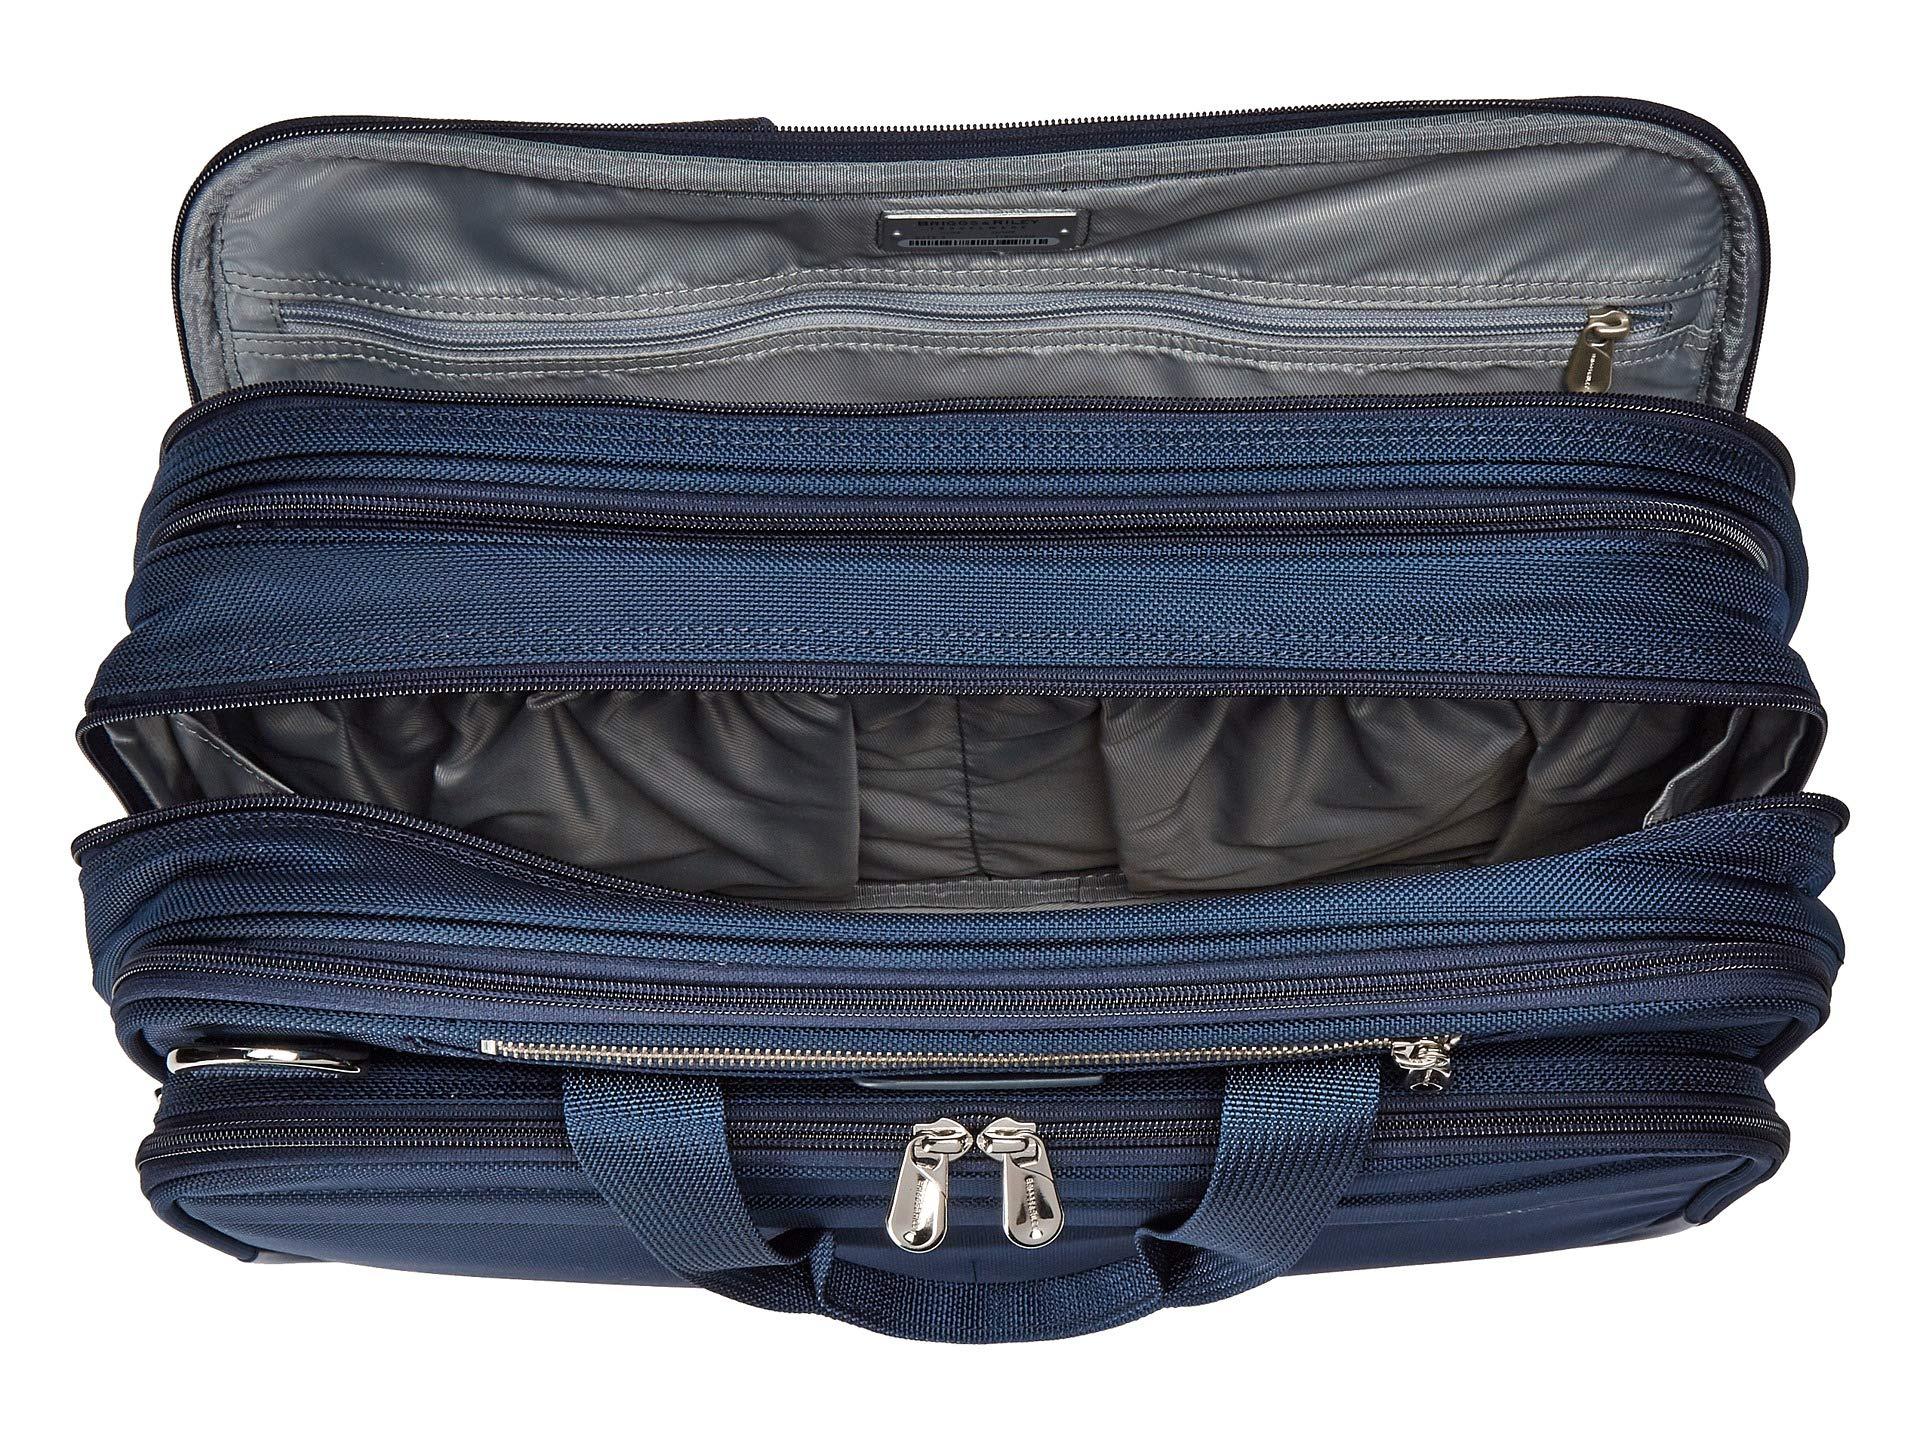 Riley Bag Briggs amp; Baseline Cabin Navy Expandable r5SBqSxwX